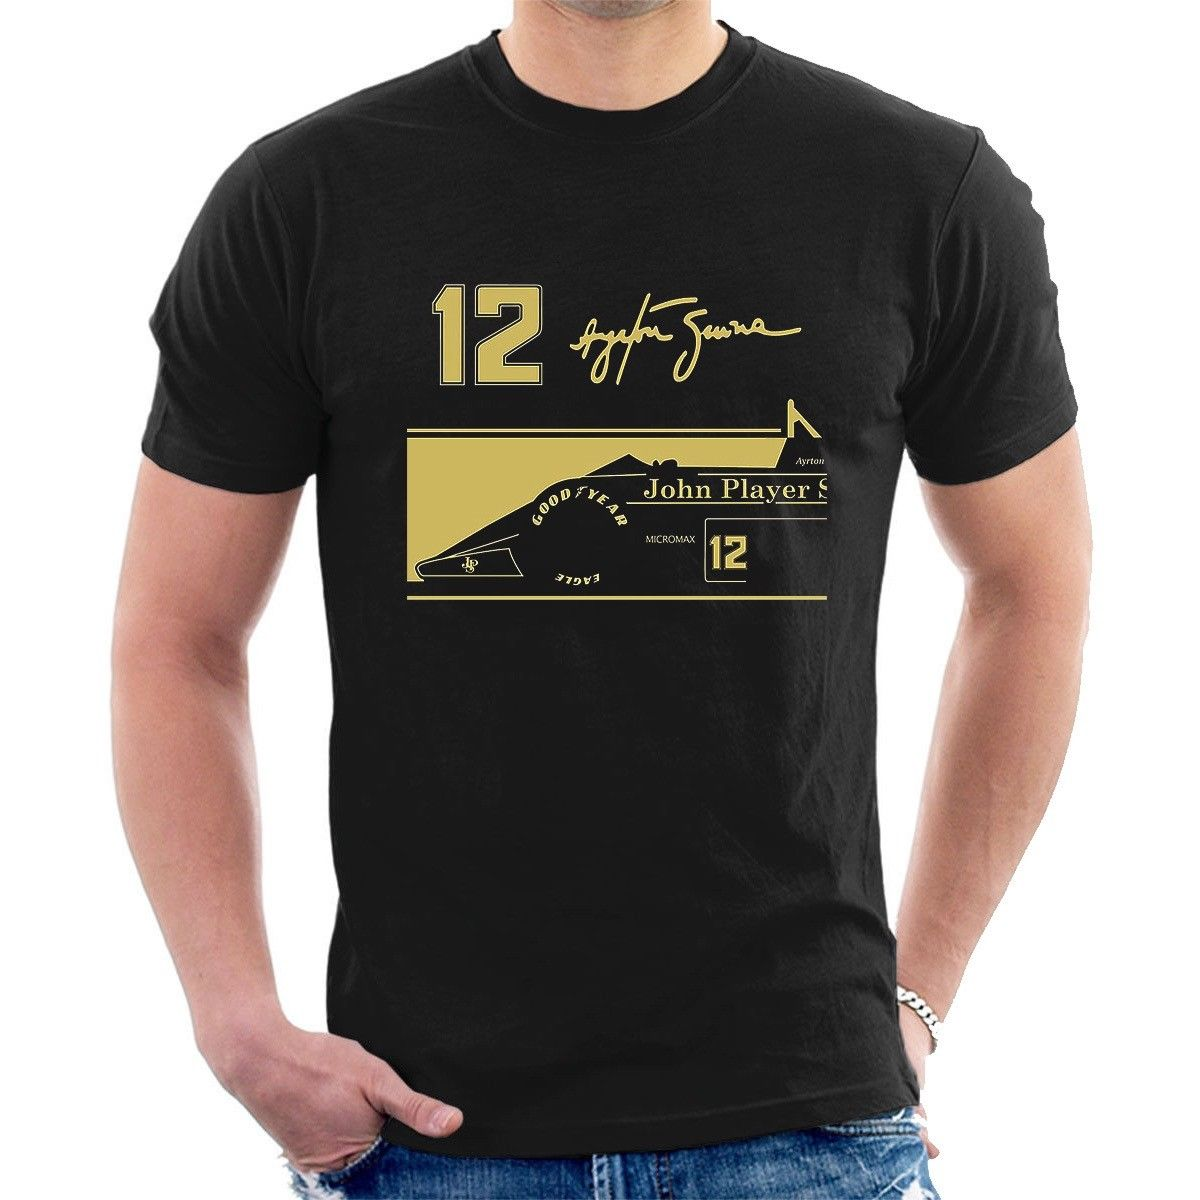 2018-nova-moda-casual-homens-camiseta-novidade-o-pescoco-tops-ayrton-font-b-senna-b-font-jps-tribute-t-shirt-12-assinatura-t-shirts-a-granel